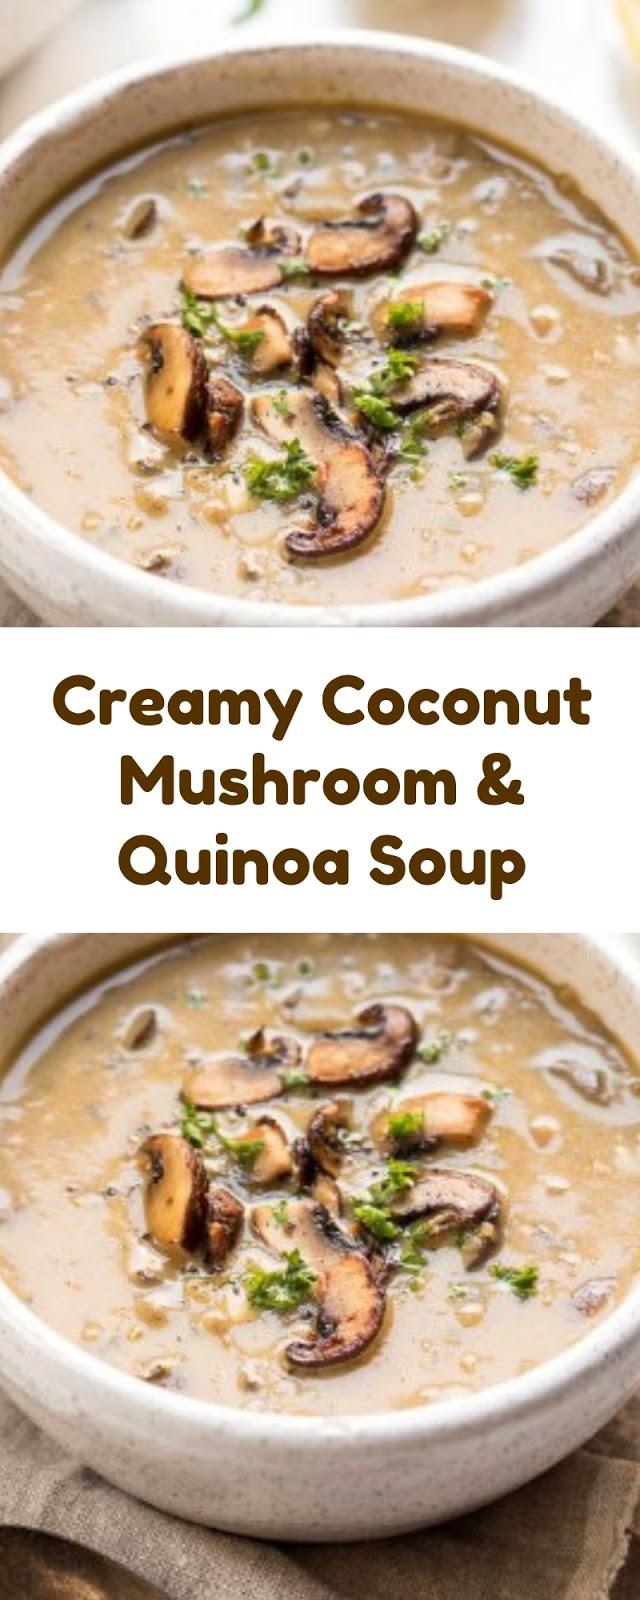 Delicious Creamy Coconut Mushroom & Quinoa Soup Recipe